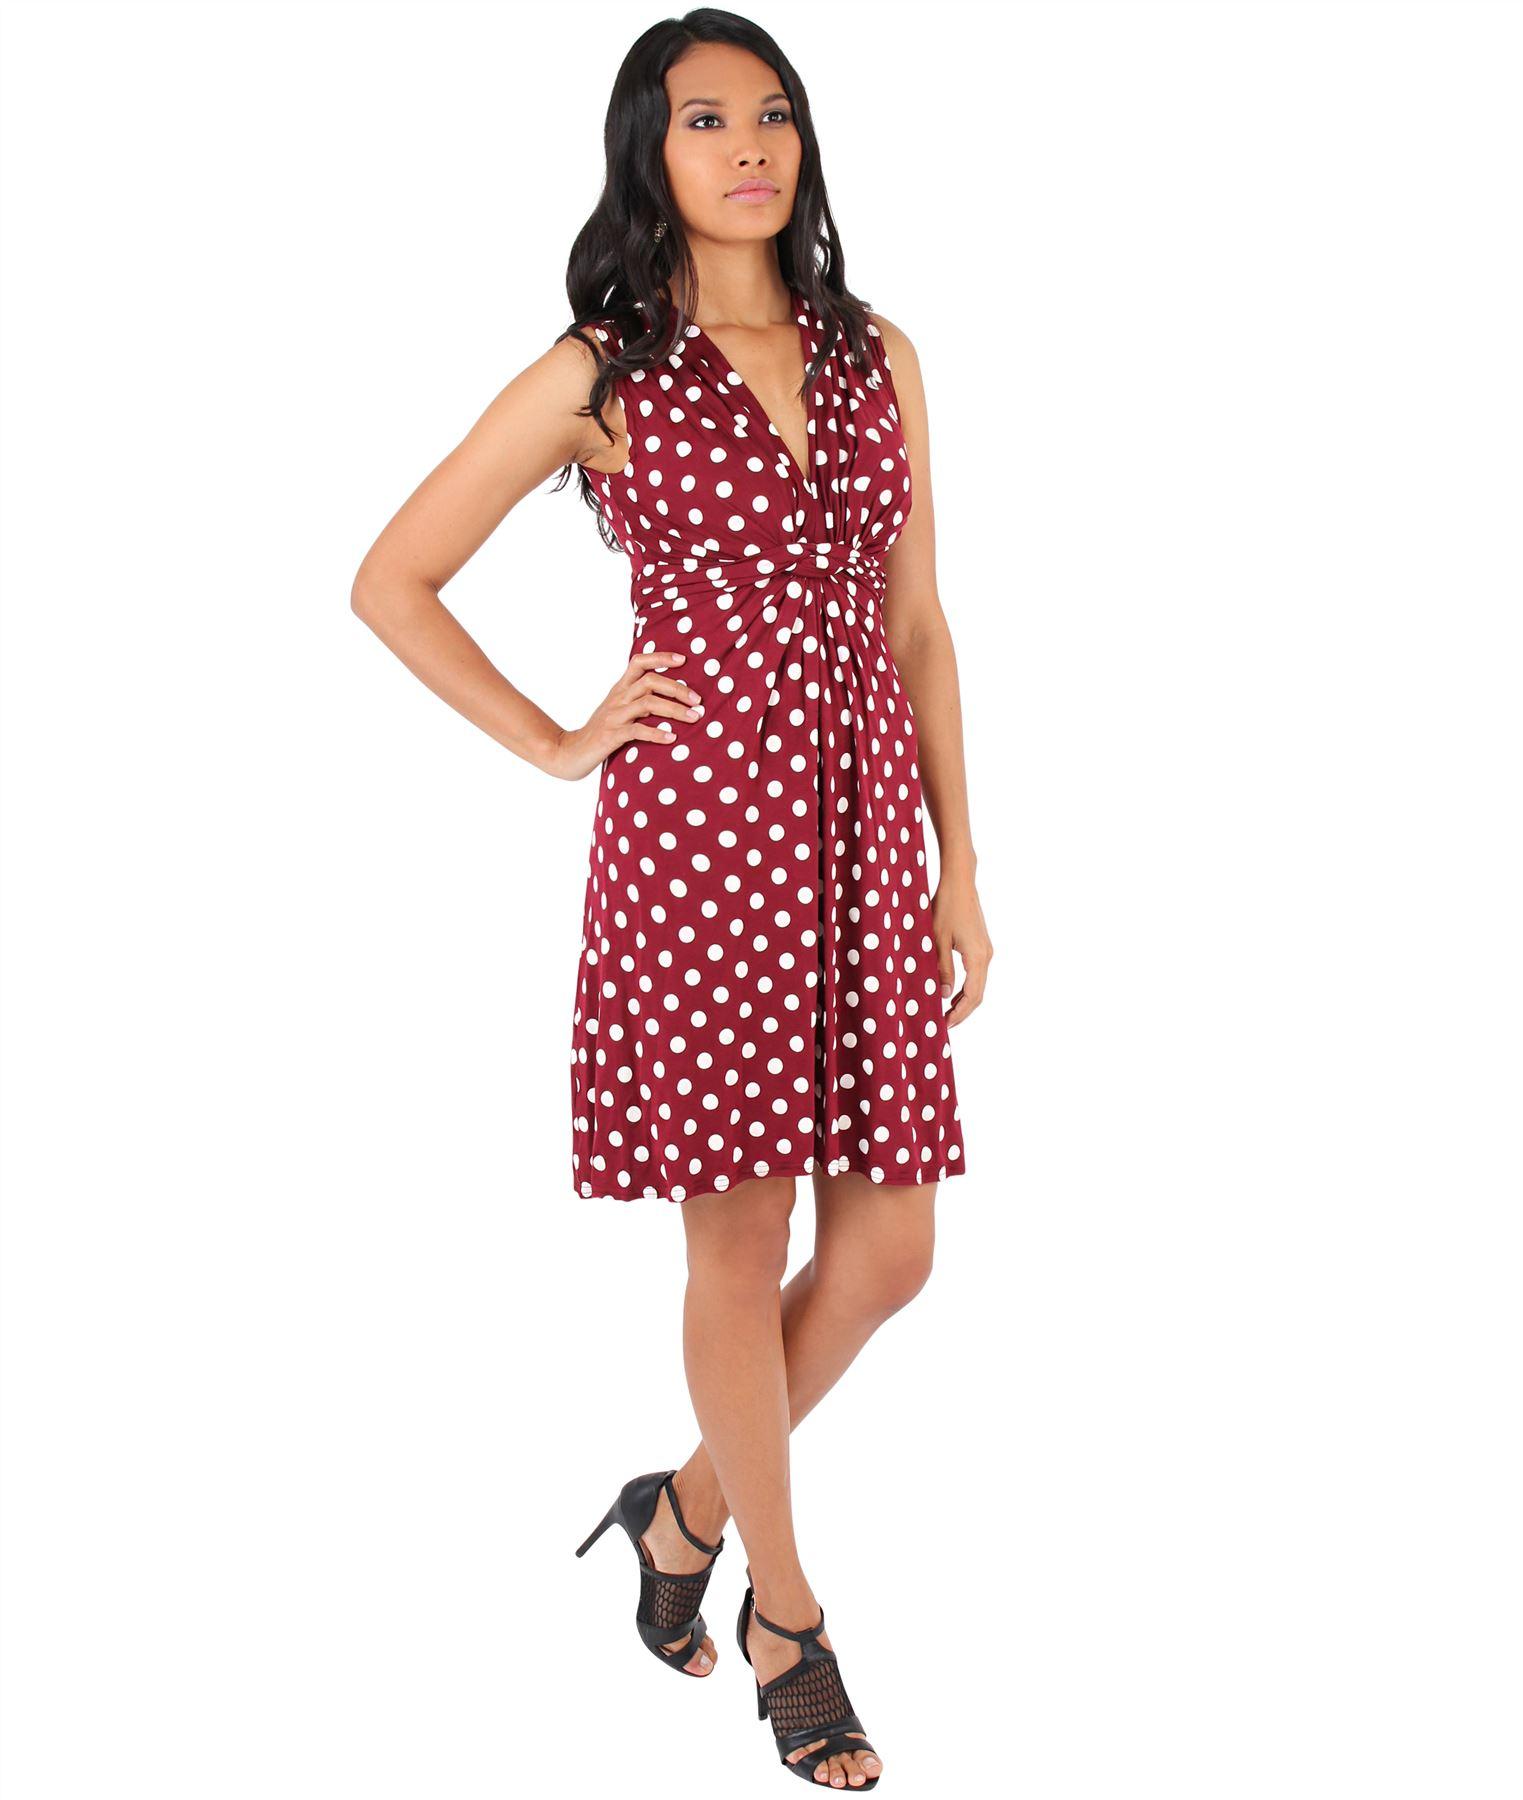 Womens-Polka-Dot-Retro-Dress-Pleated-Skirt-Wrap-Mini-V-Neck-Top-Swing-Party thumbnail 39